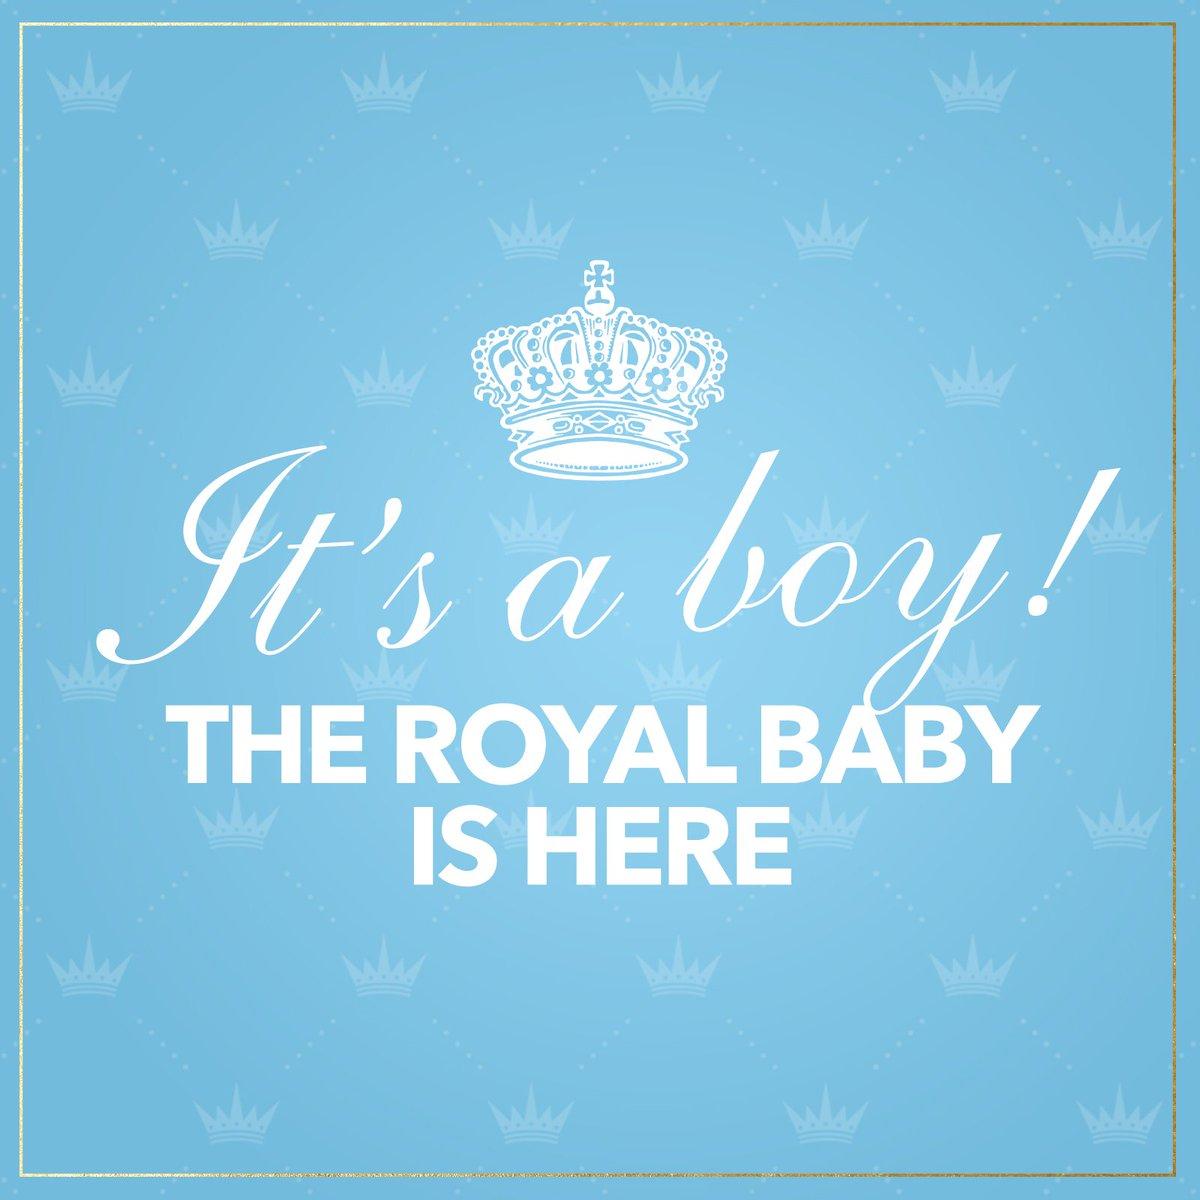 【速報】王子誕生! ハリー王子&メーガン妃